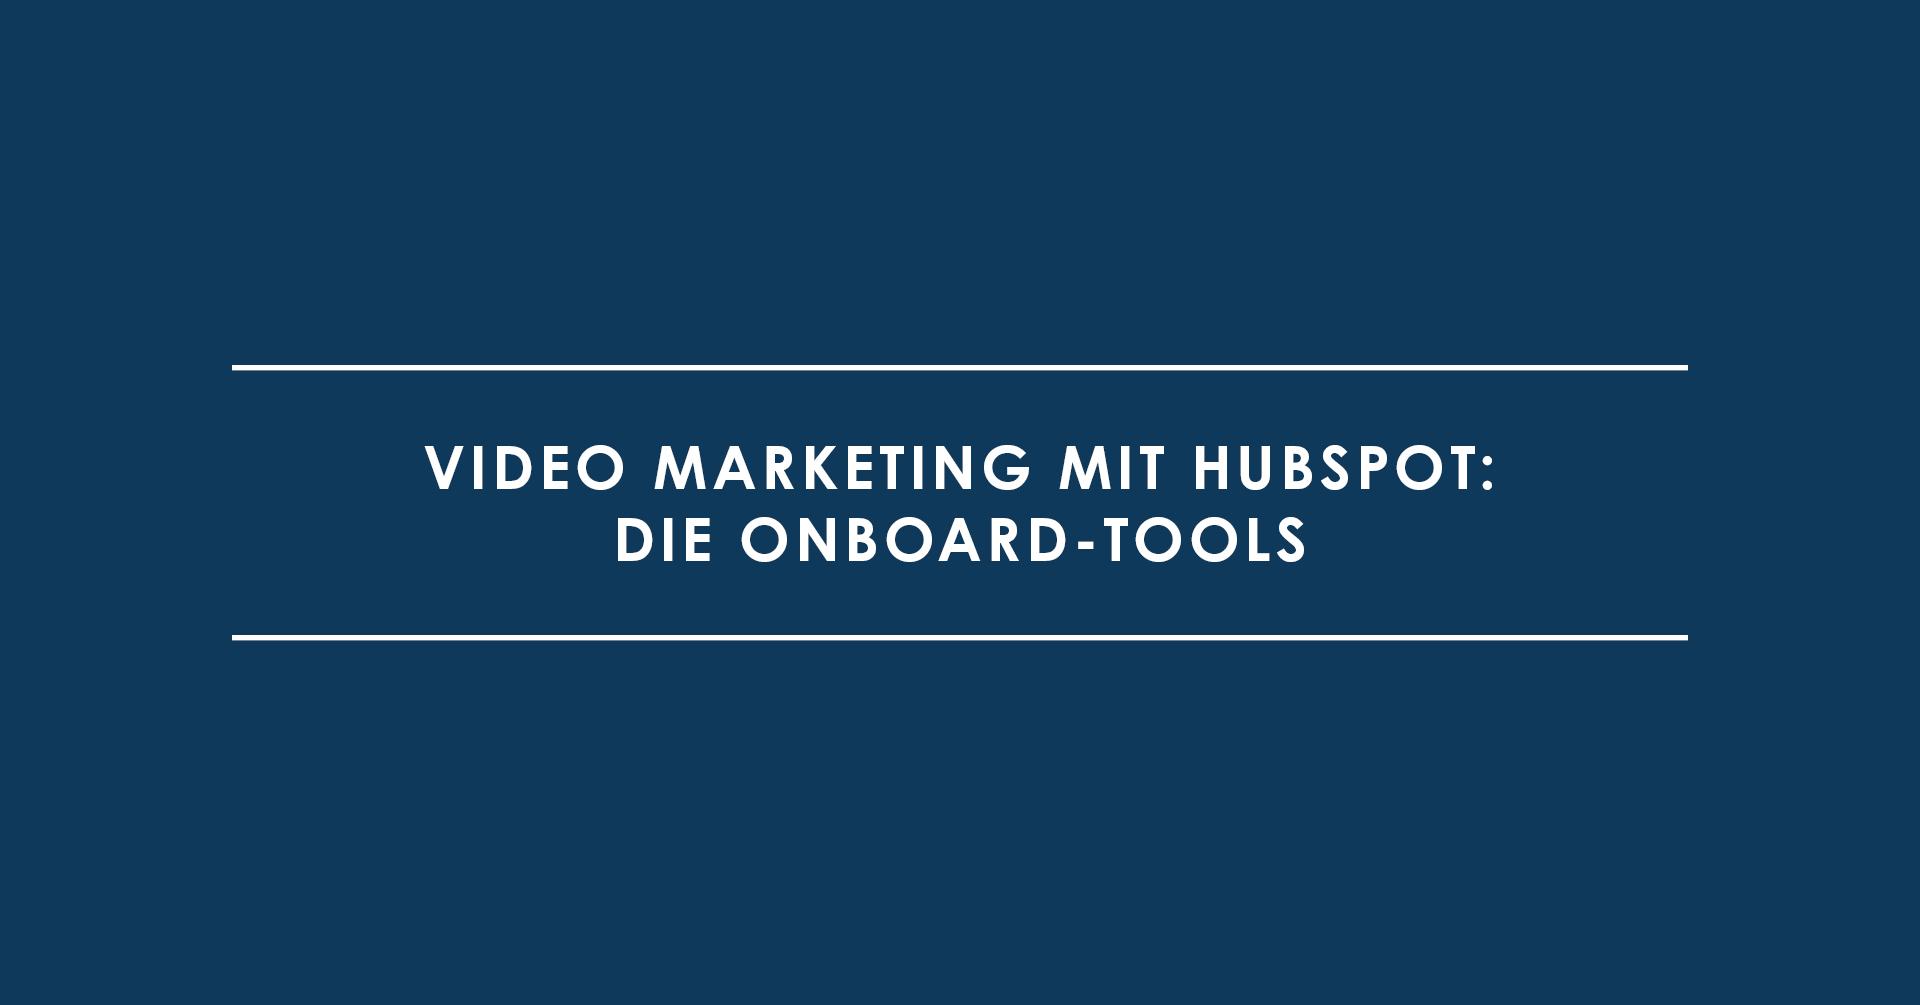 Video Marketing mit HubSpot: die Onboard-Tools